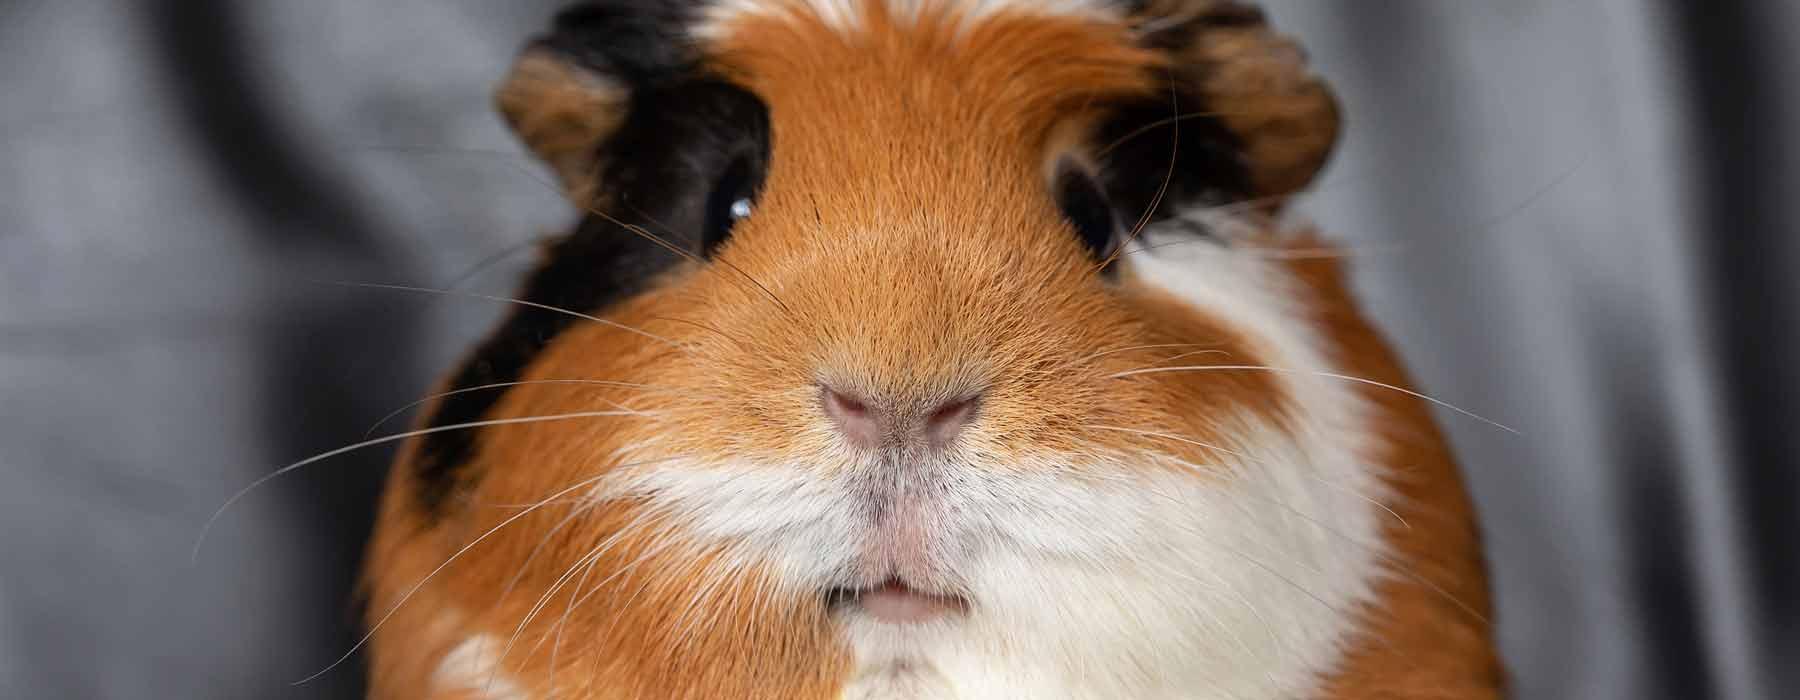 ginger, white and black short haired guinea pig